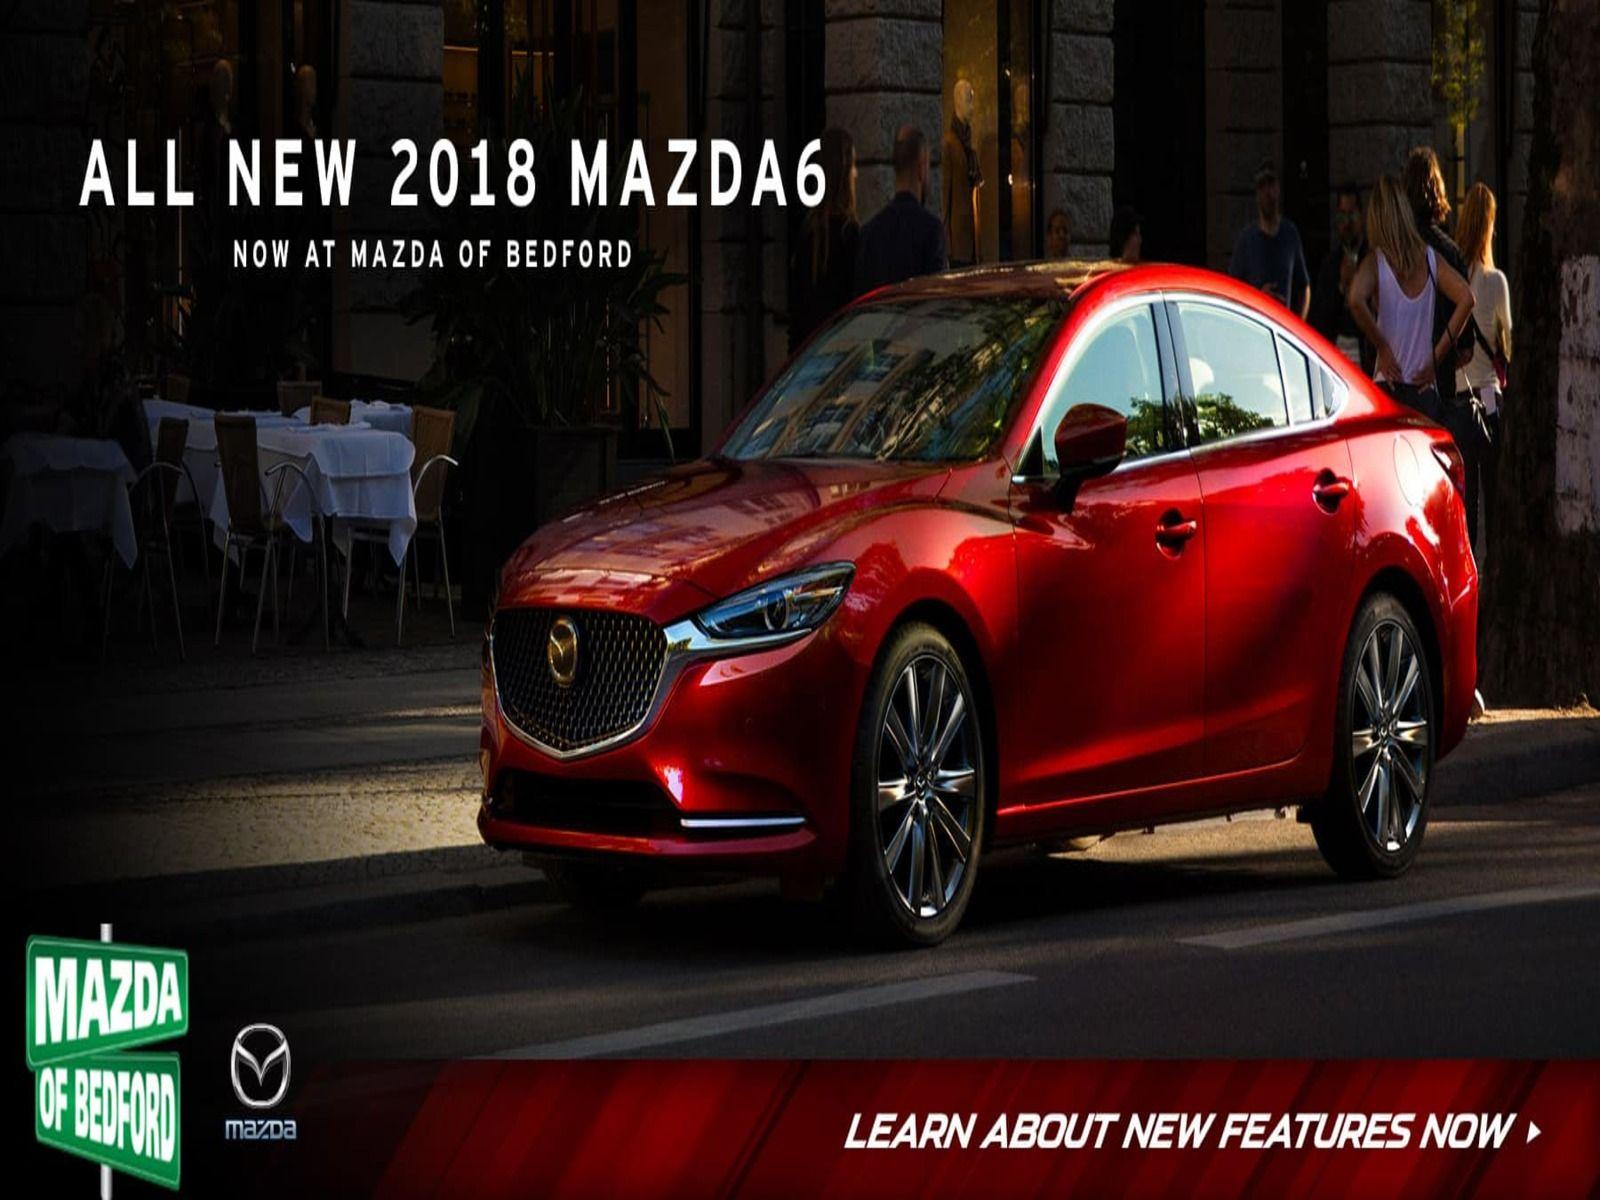 Who Owns Mazda >> Who Owns Mazda Of Bedford World Car Brands Mazda Car